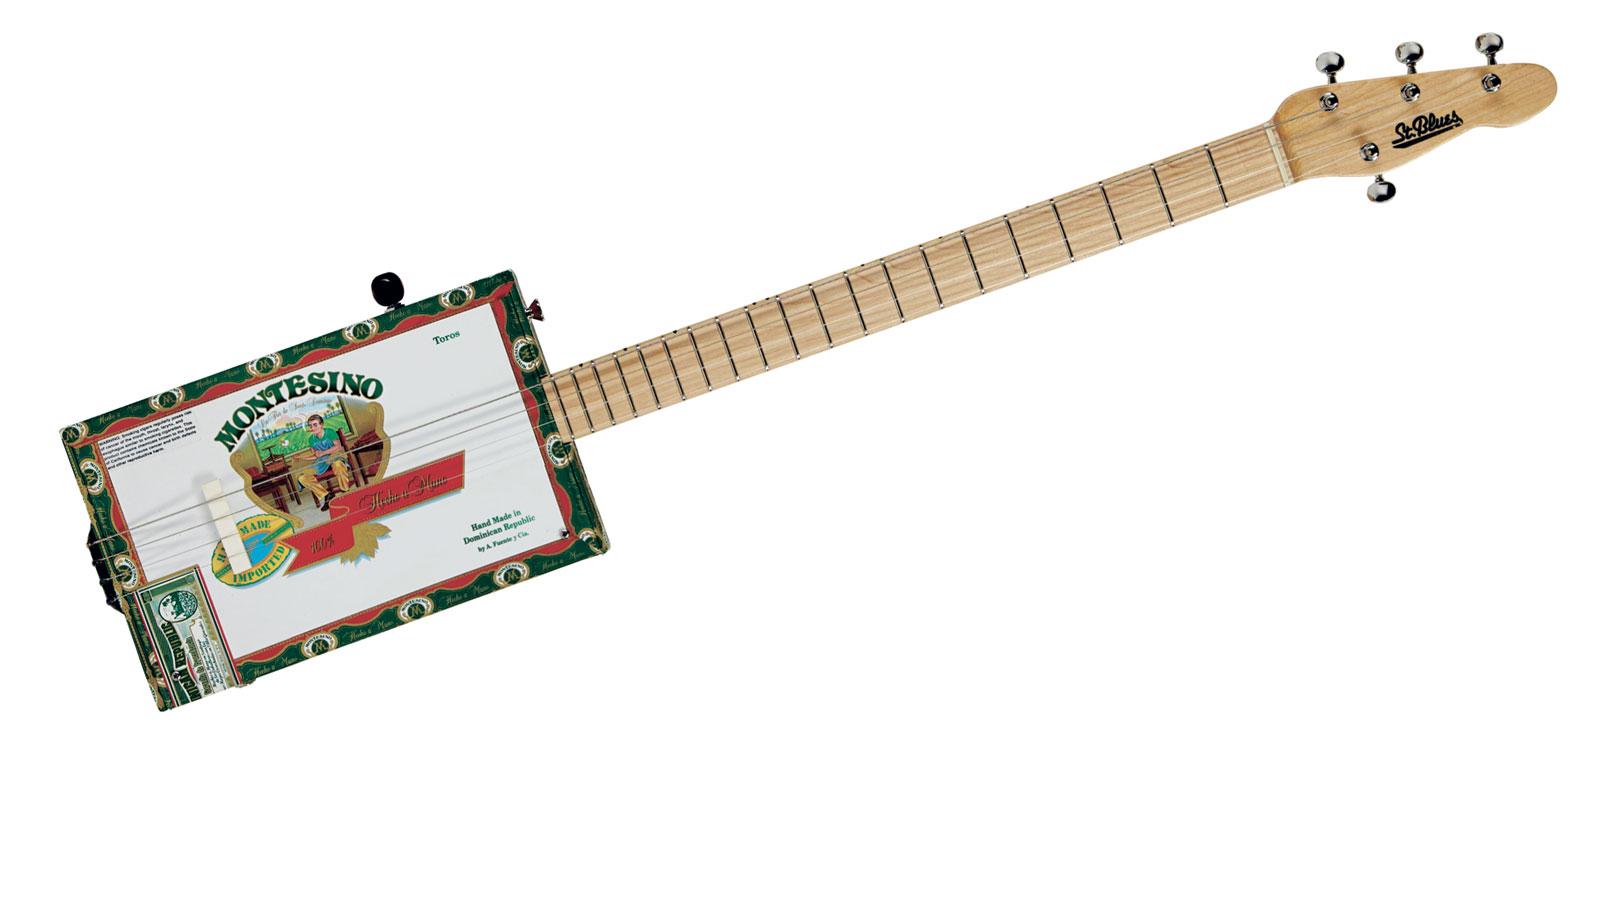 Cigar Box Guitar String Set 3-string Electric Light Open D Tuning